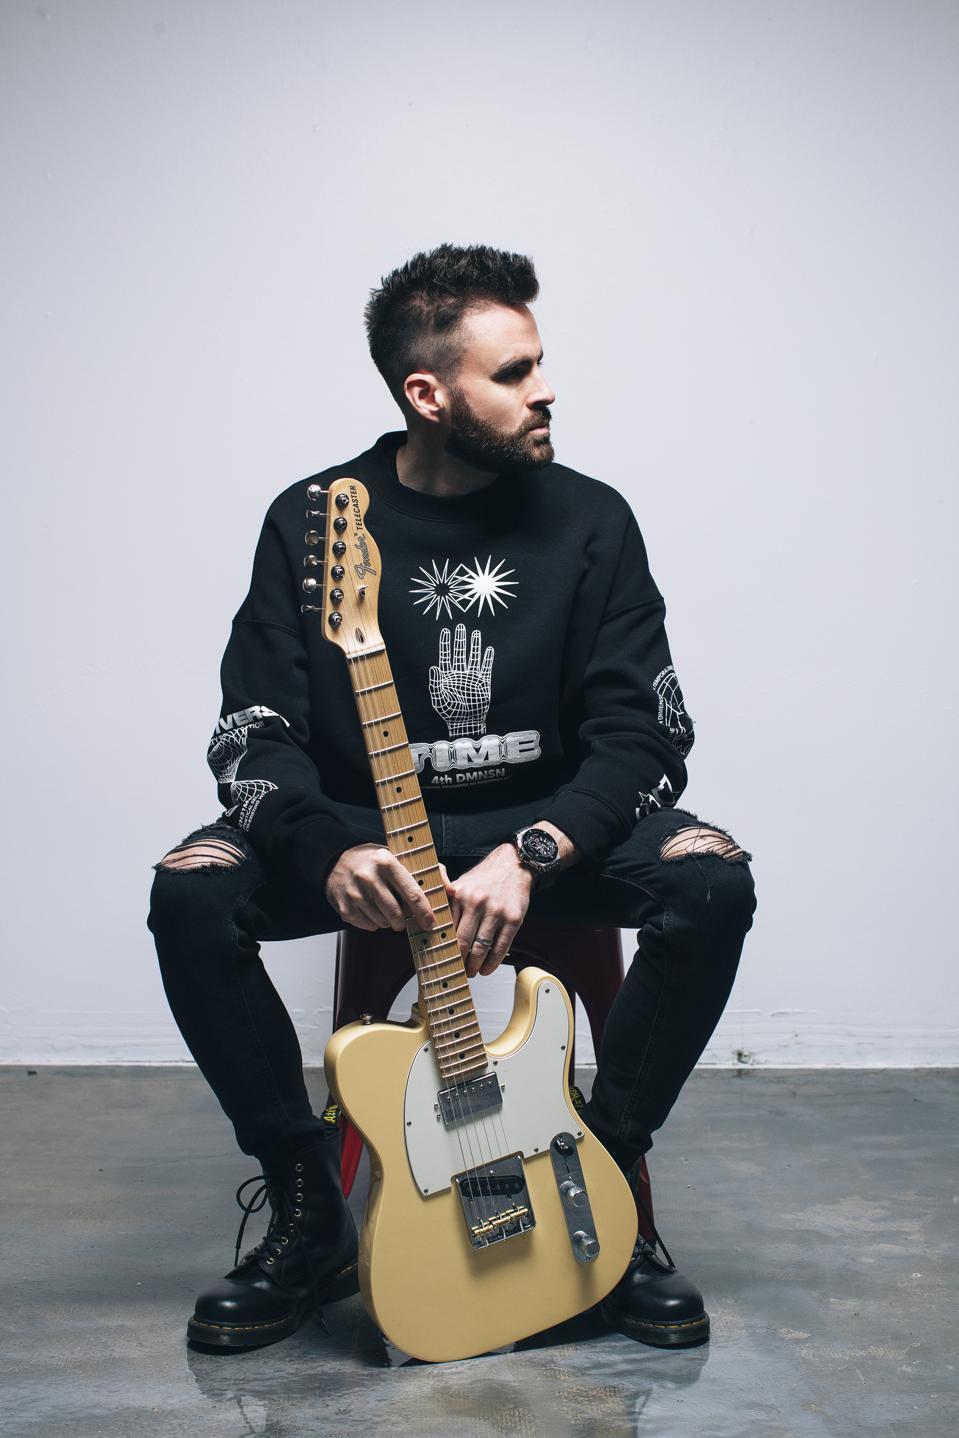 Gareth Emery is the co-founder of Garuda Music.